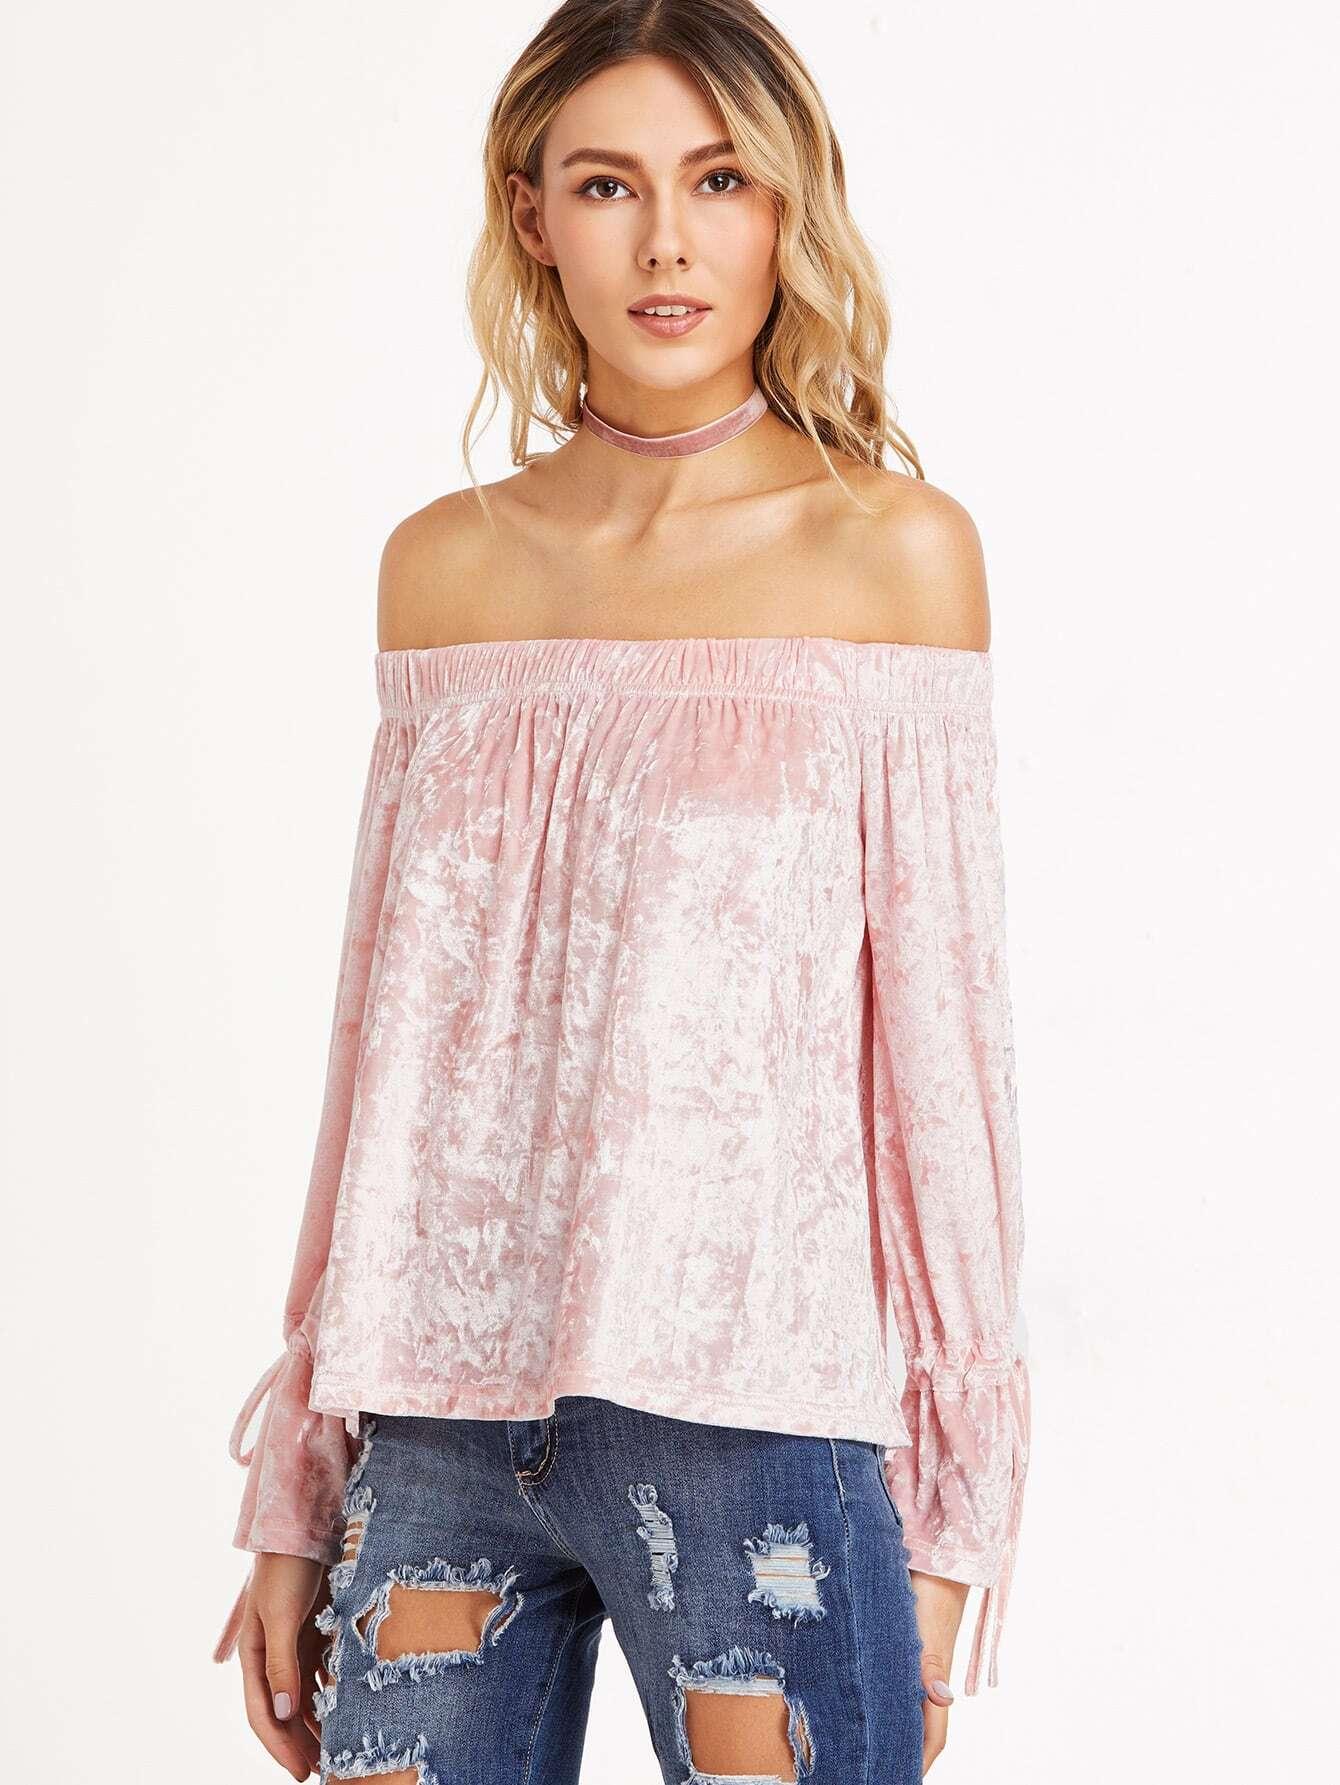 blouse161118723_2